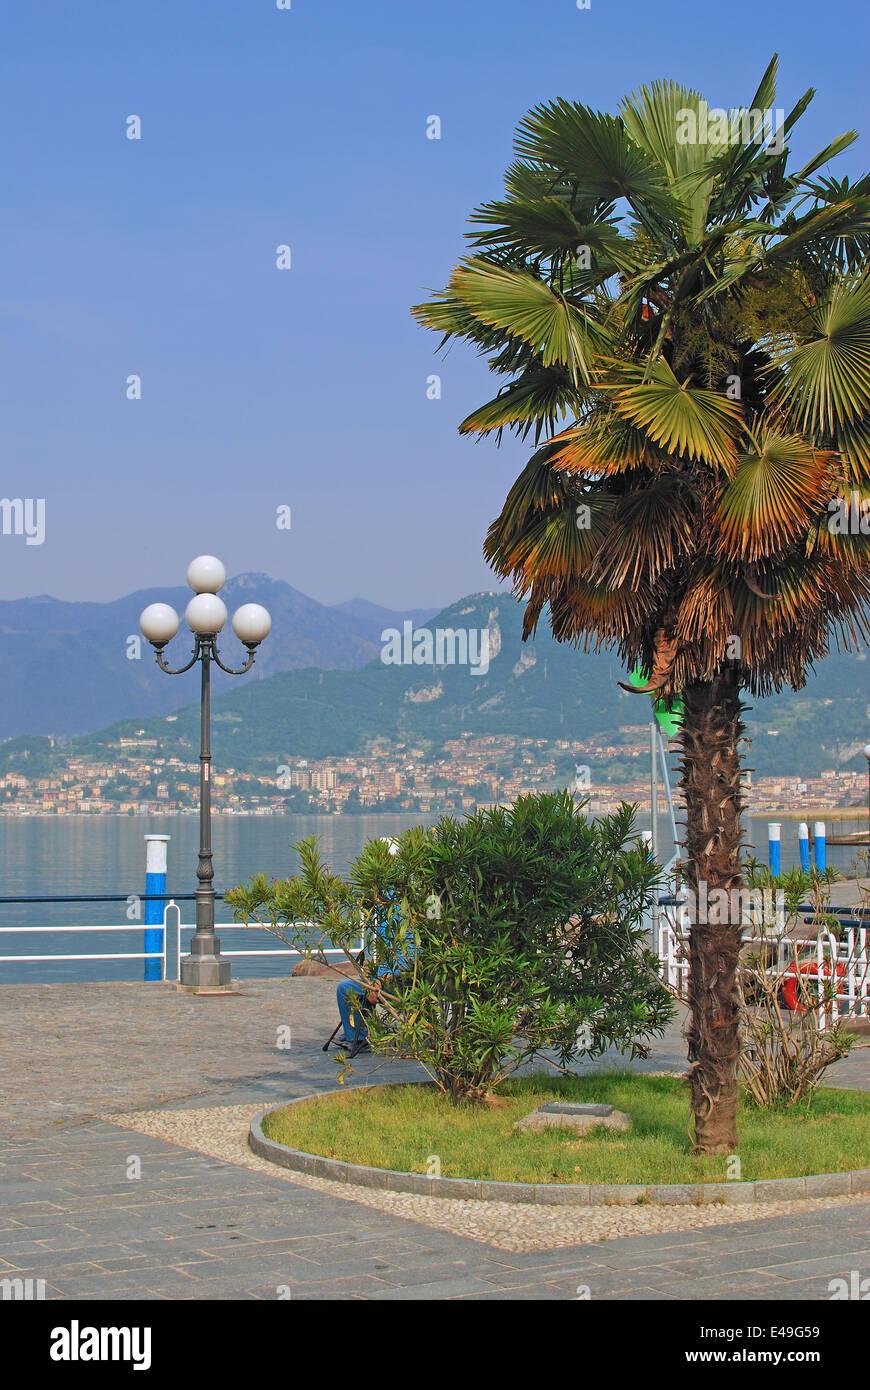 Iseo on Lake Iseo,Lombardy,Italy - Stock Image